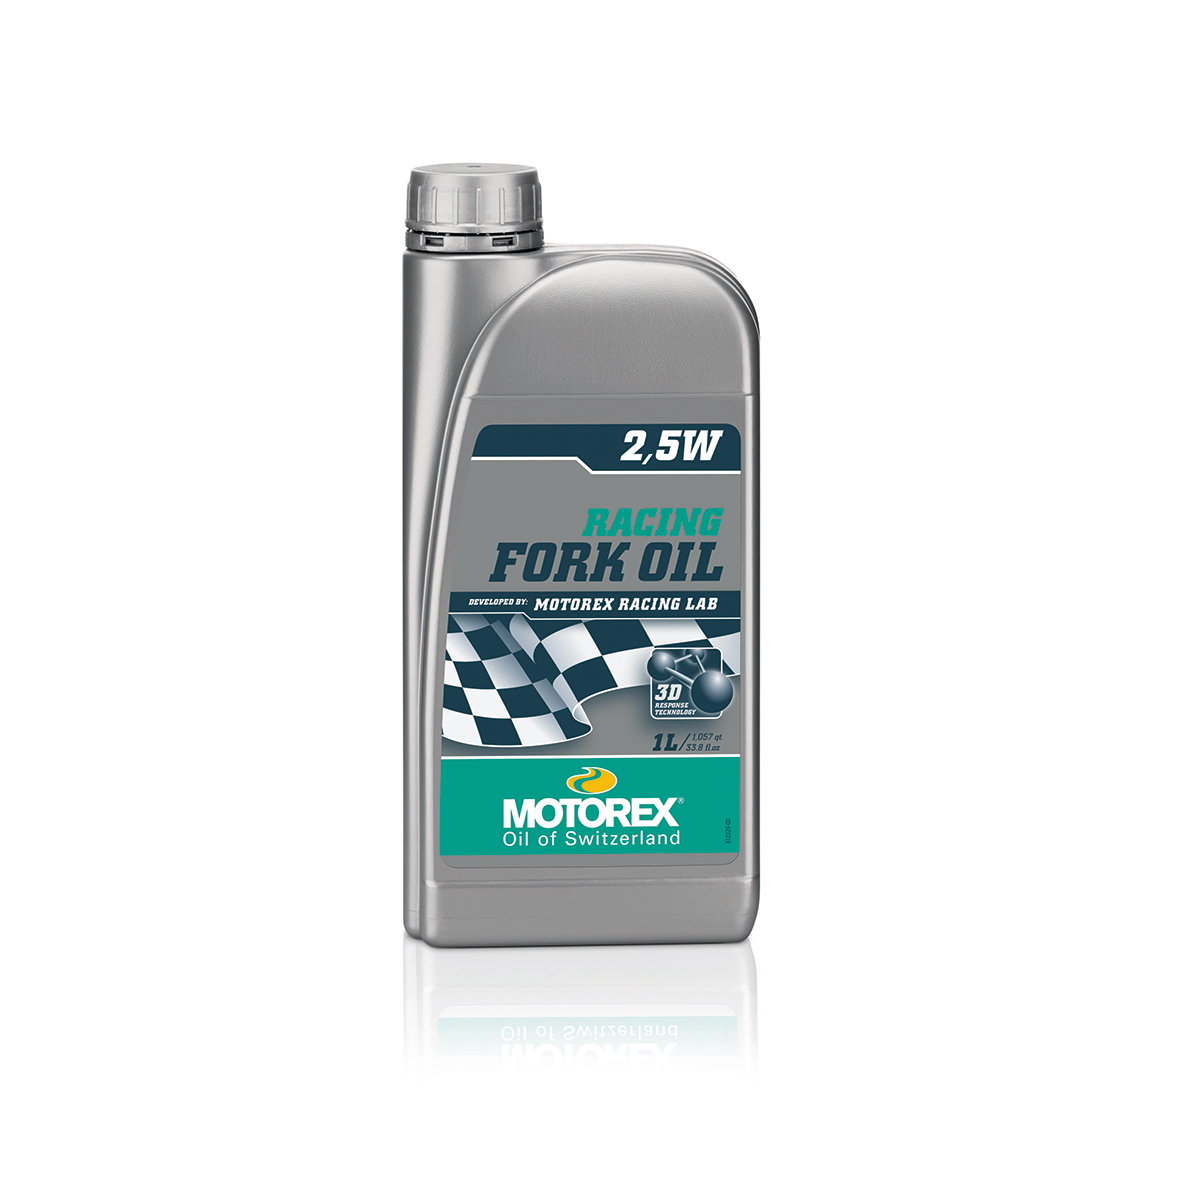 20200827_RACING_FORK_OIL_2_5W_1L